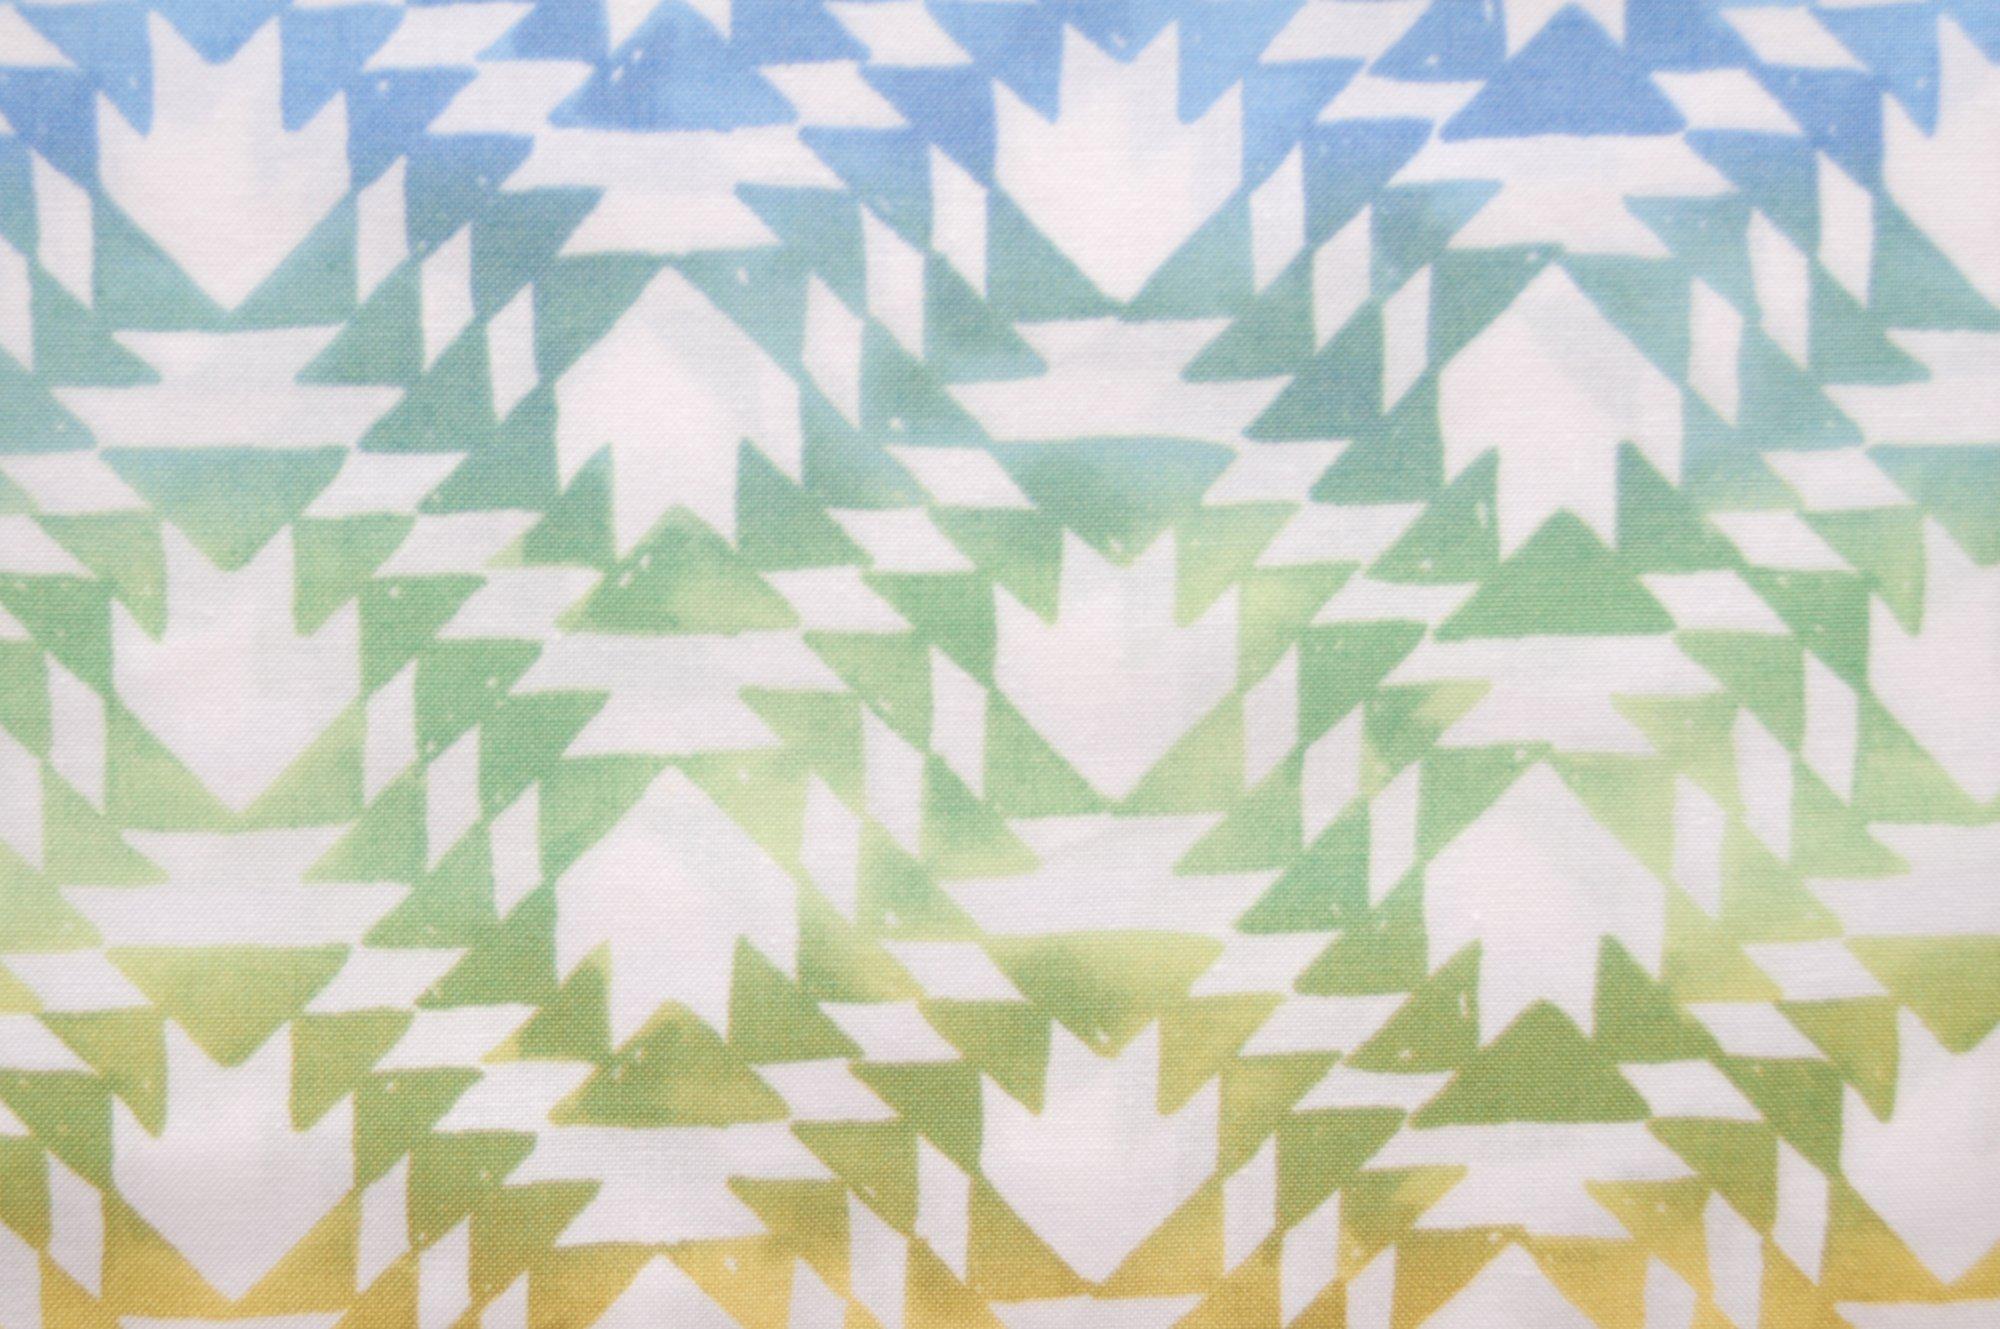 Dream Catcher - Tribal from Josephine Kimberling for Blend Fabrics